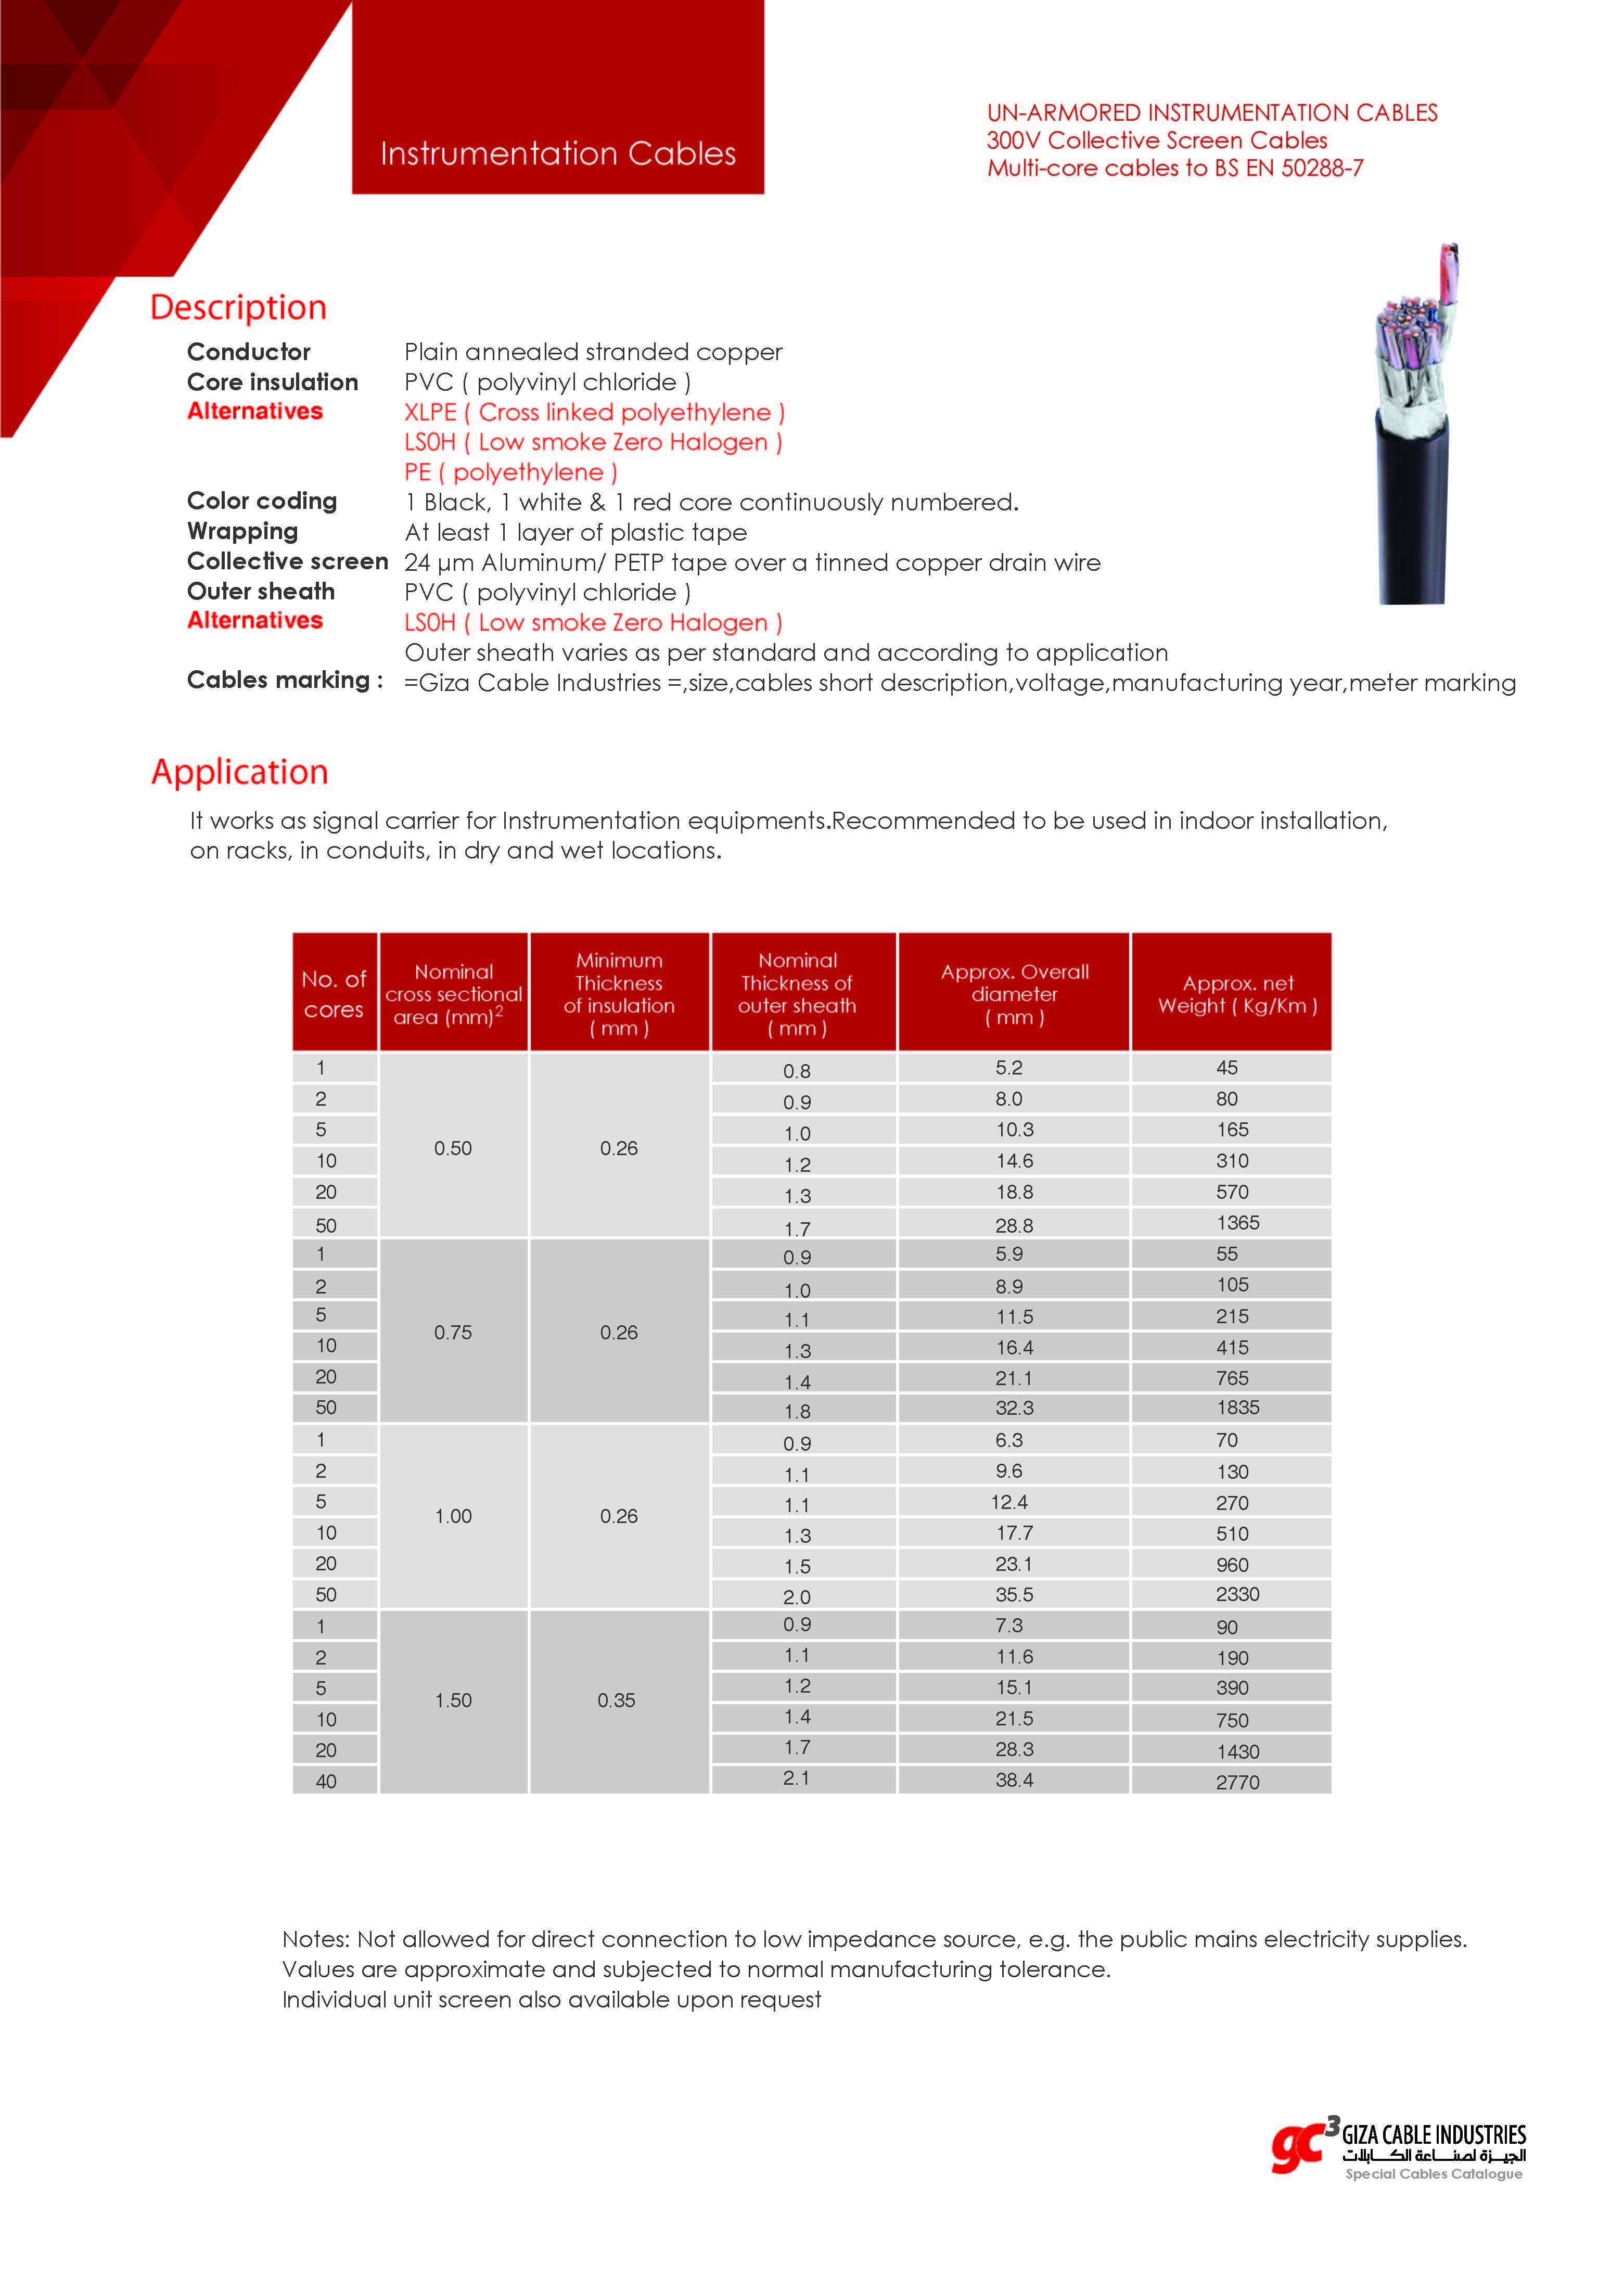 UN-ARMORED INSTRUMENTATION CABLES - 300V - Multi-core cables